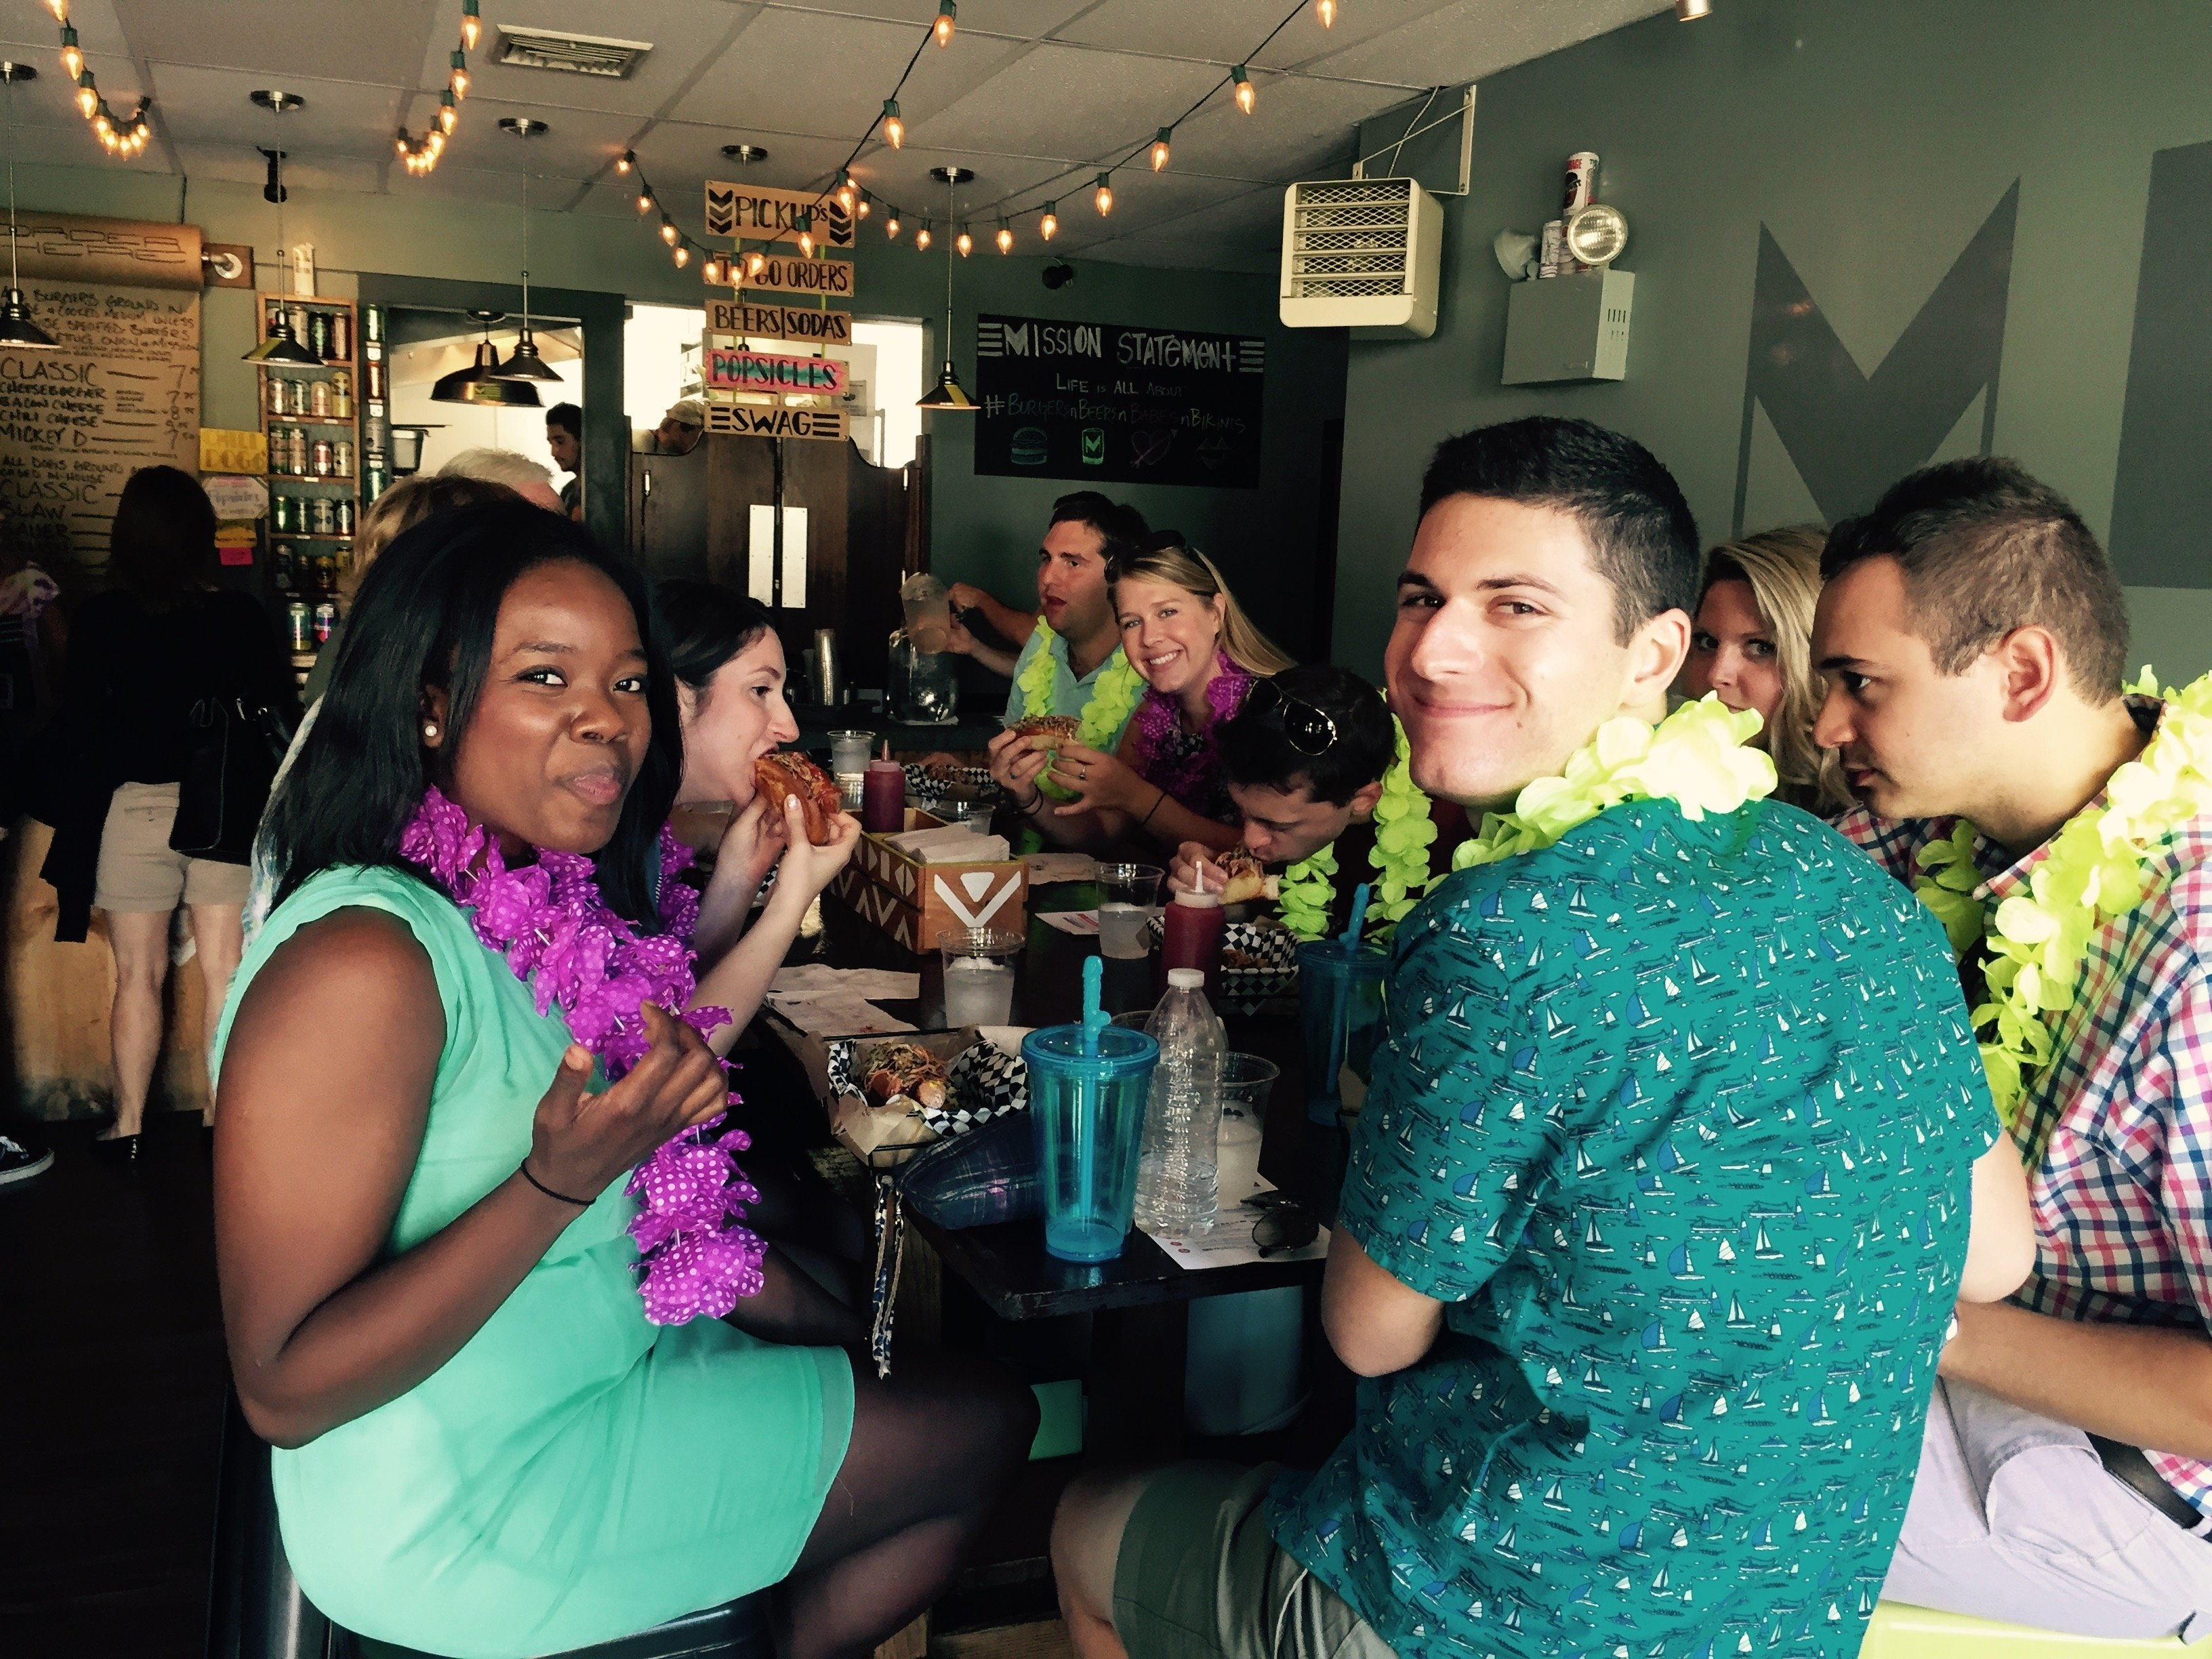 10 Ideal New England Bachelor Party Ideas fresh new england new englands great big food loving community 2020